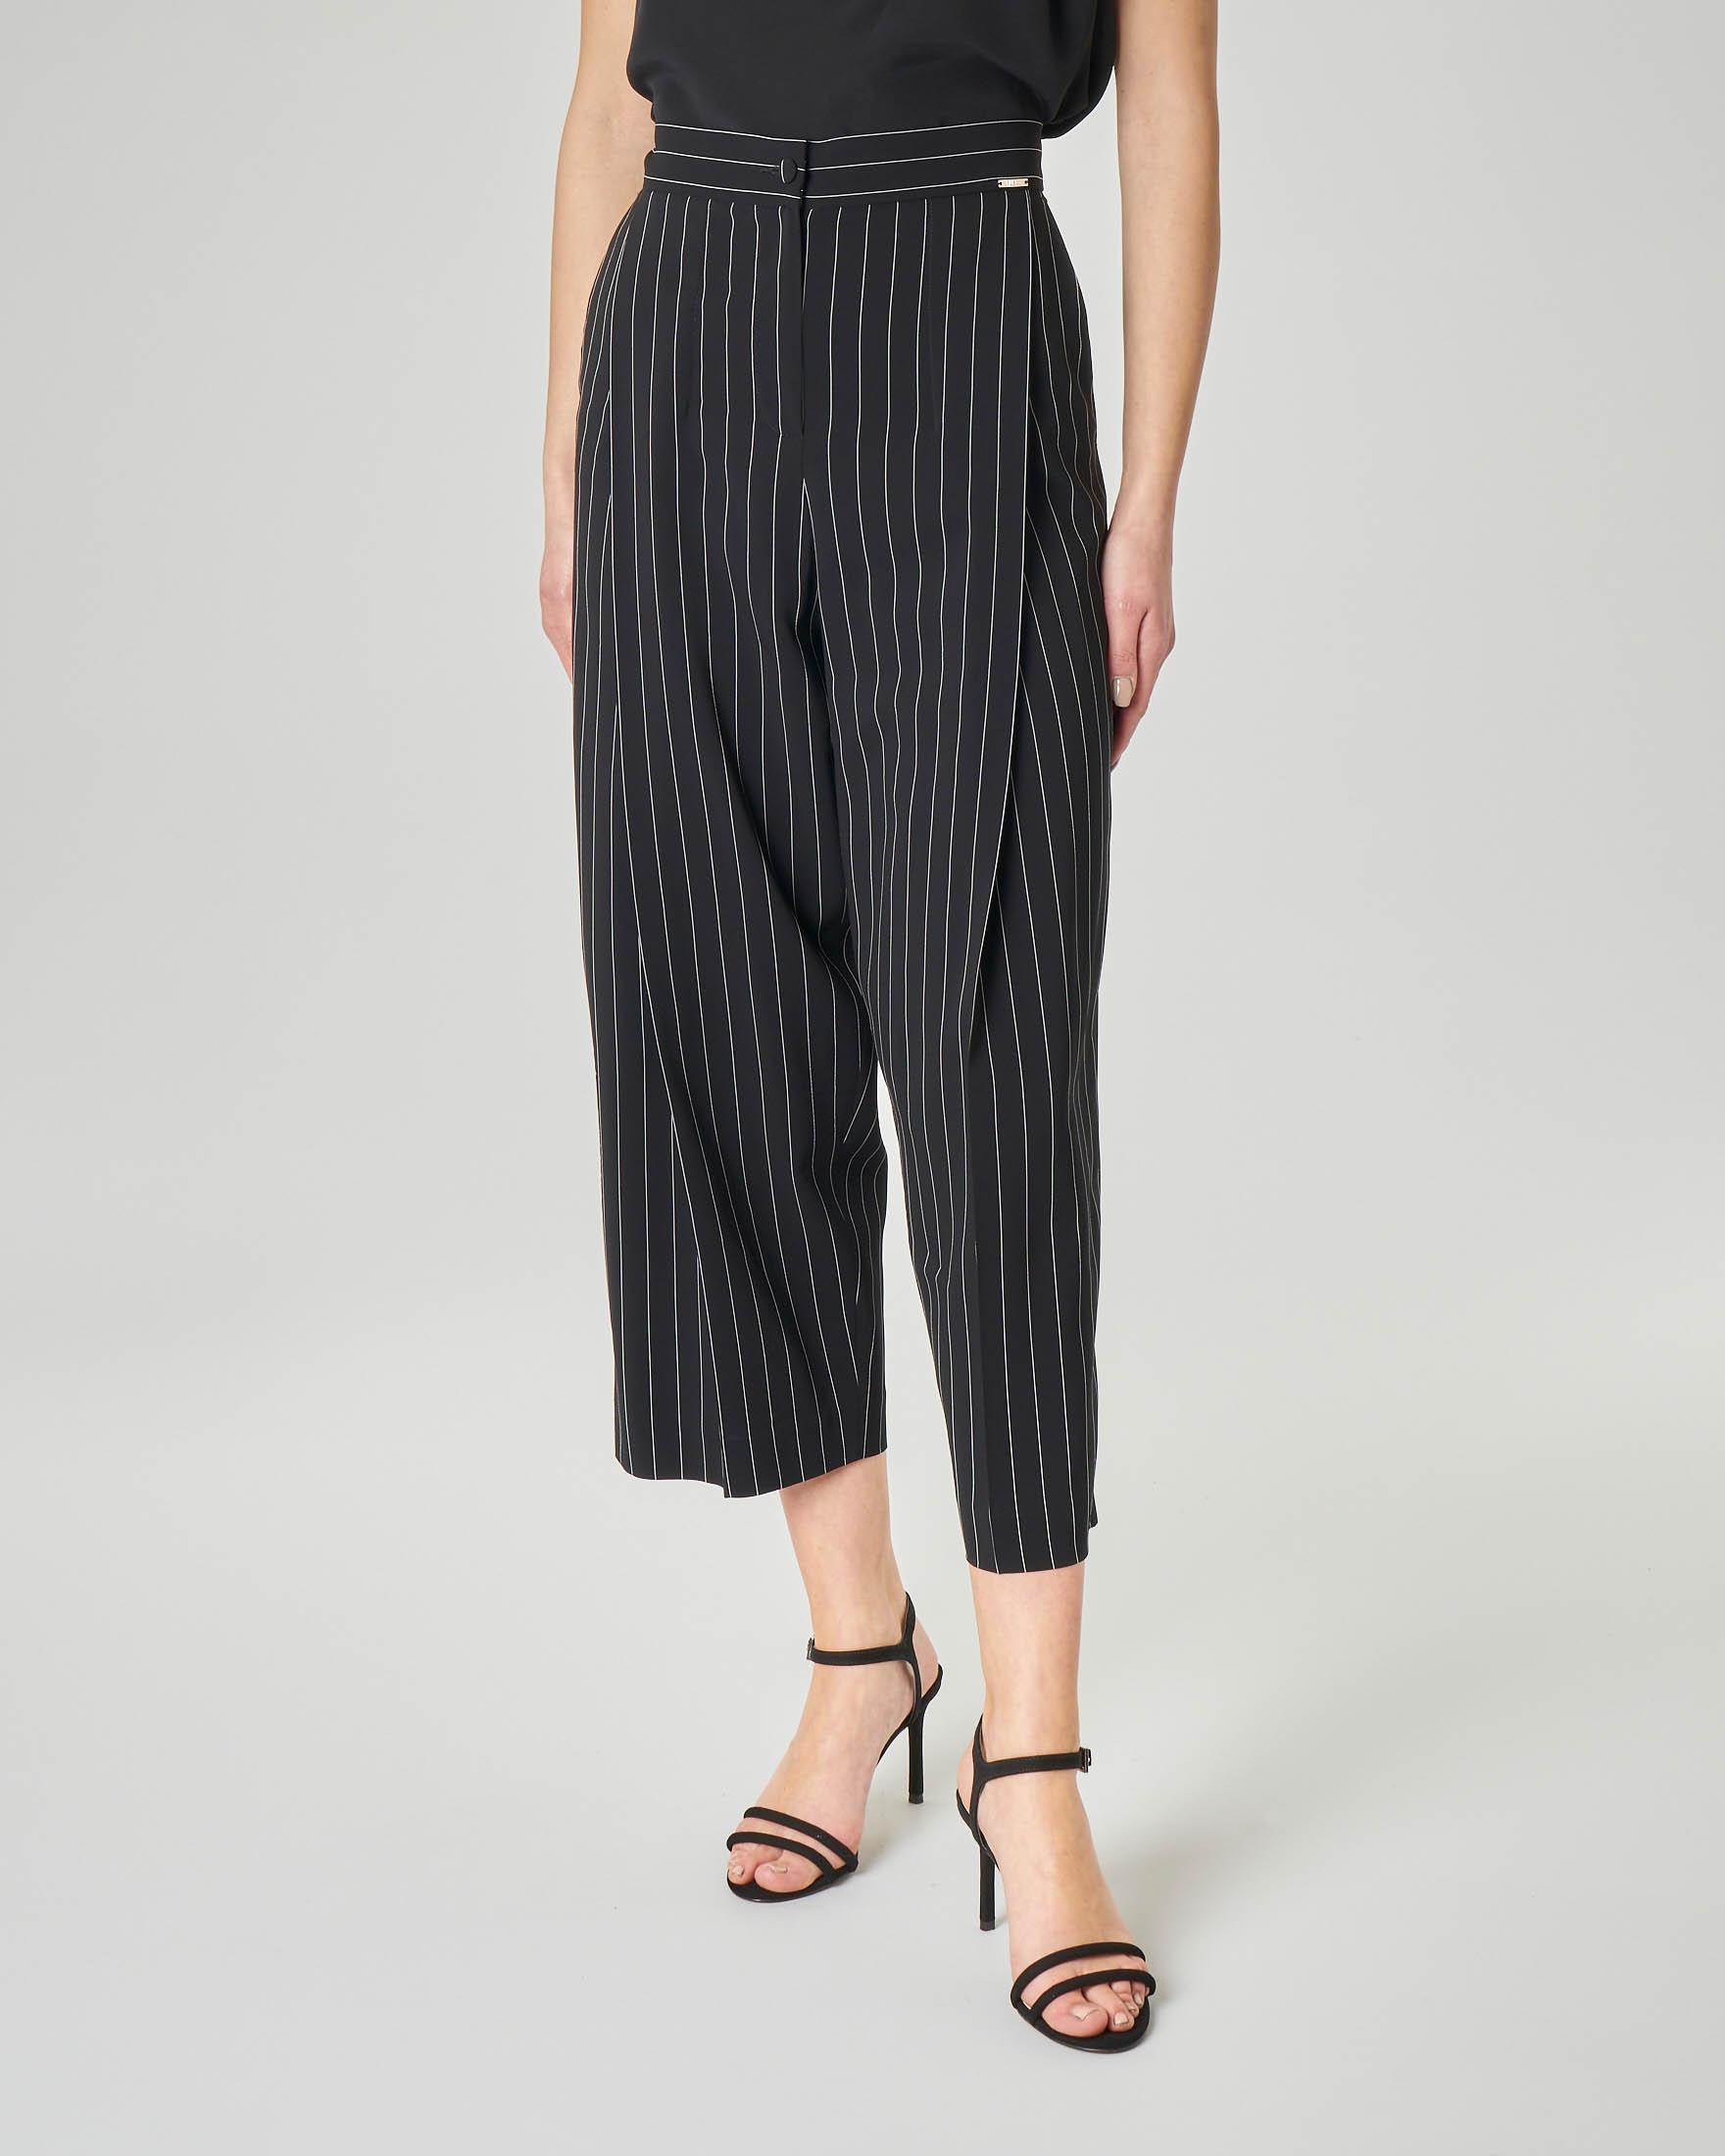 Pantalone culotte gessato